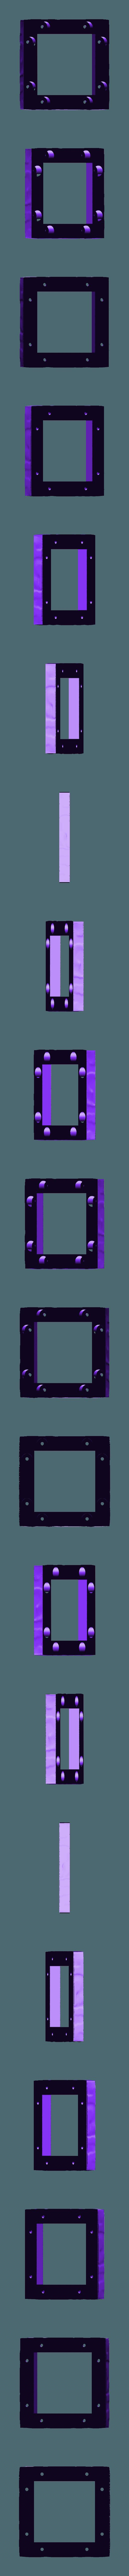 cavern_magnetic_base_2x2.stl Download free STL file Cavern Riser Blocks (Openforge 2.0 compatible) • Model to 3D print, Poxos